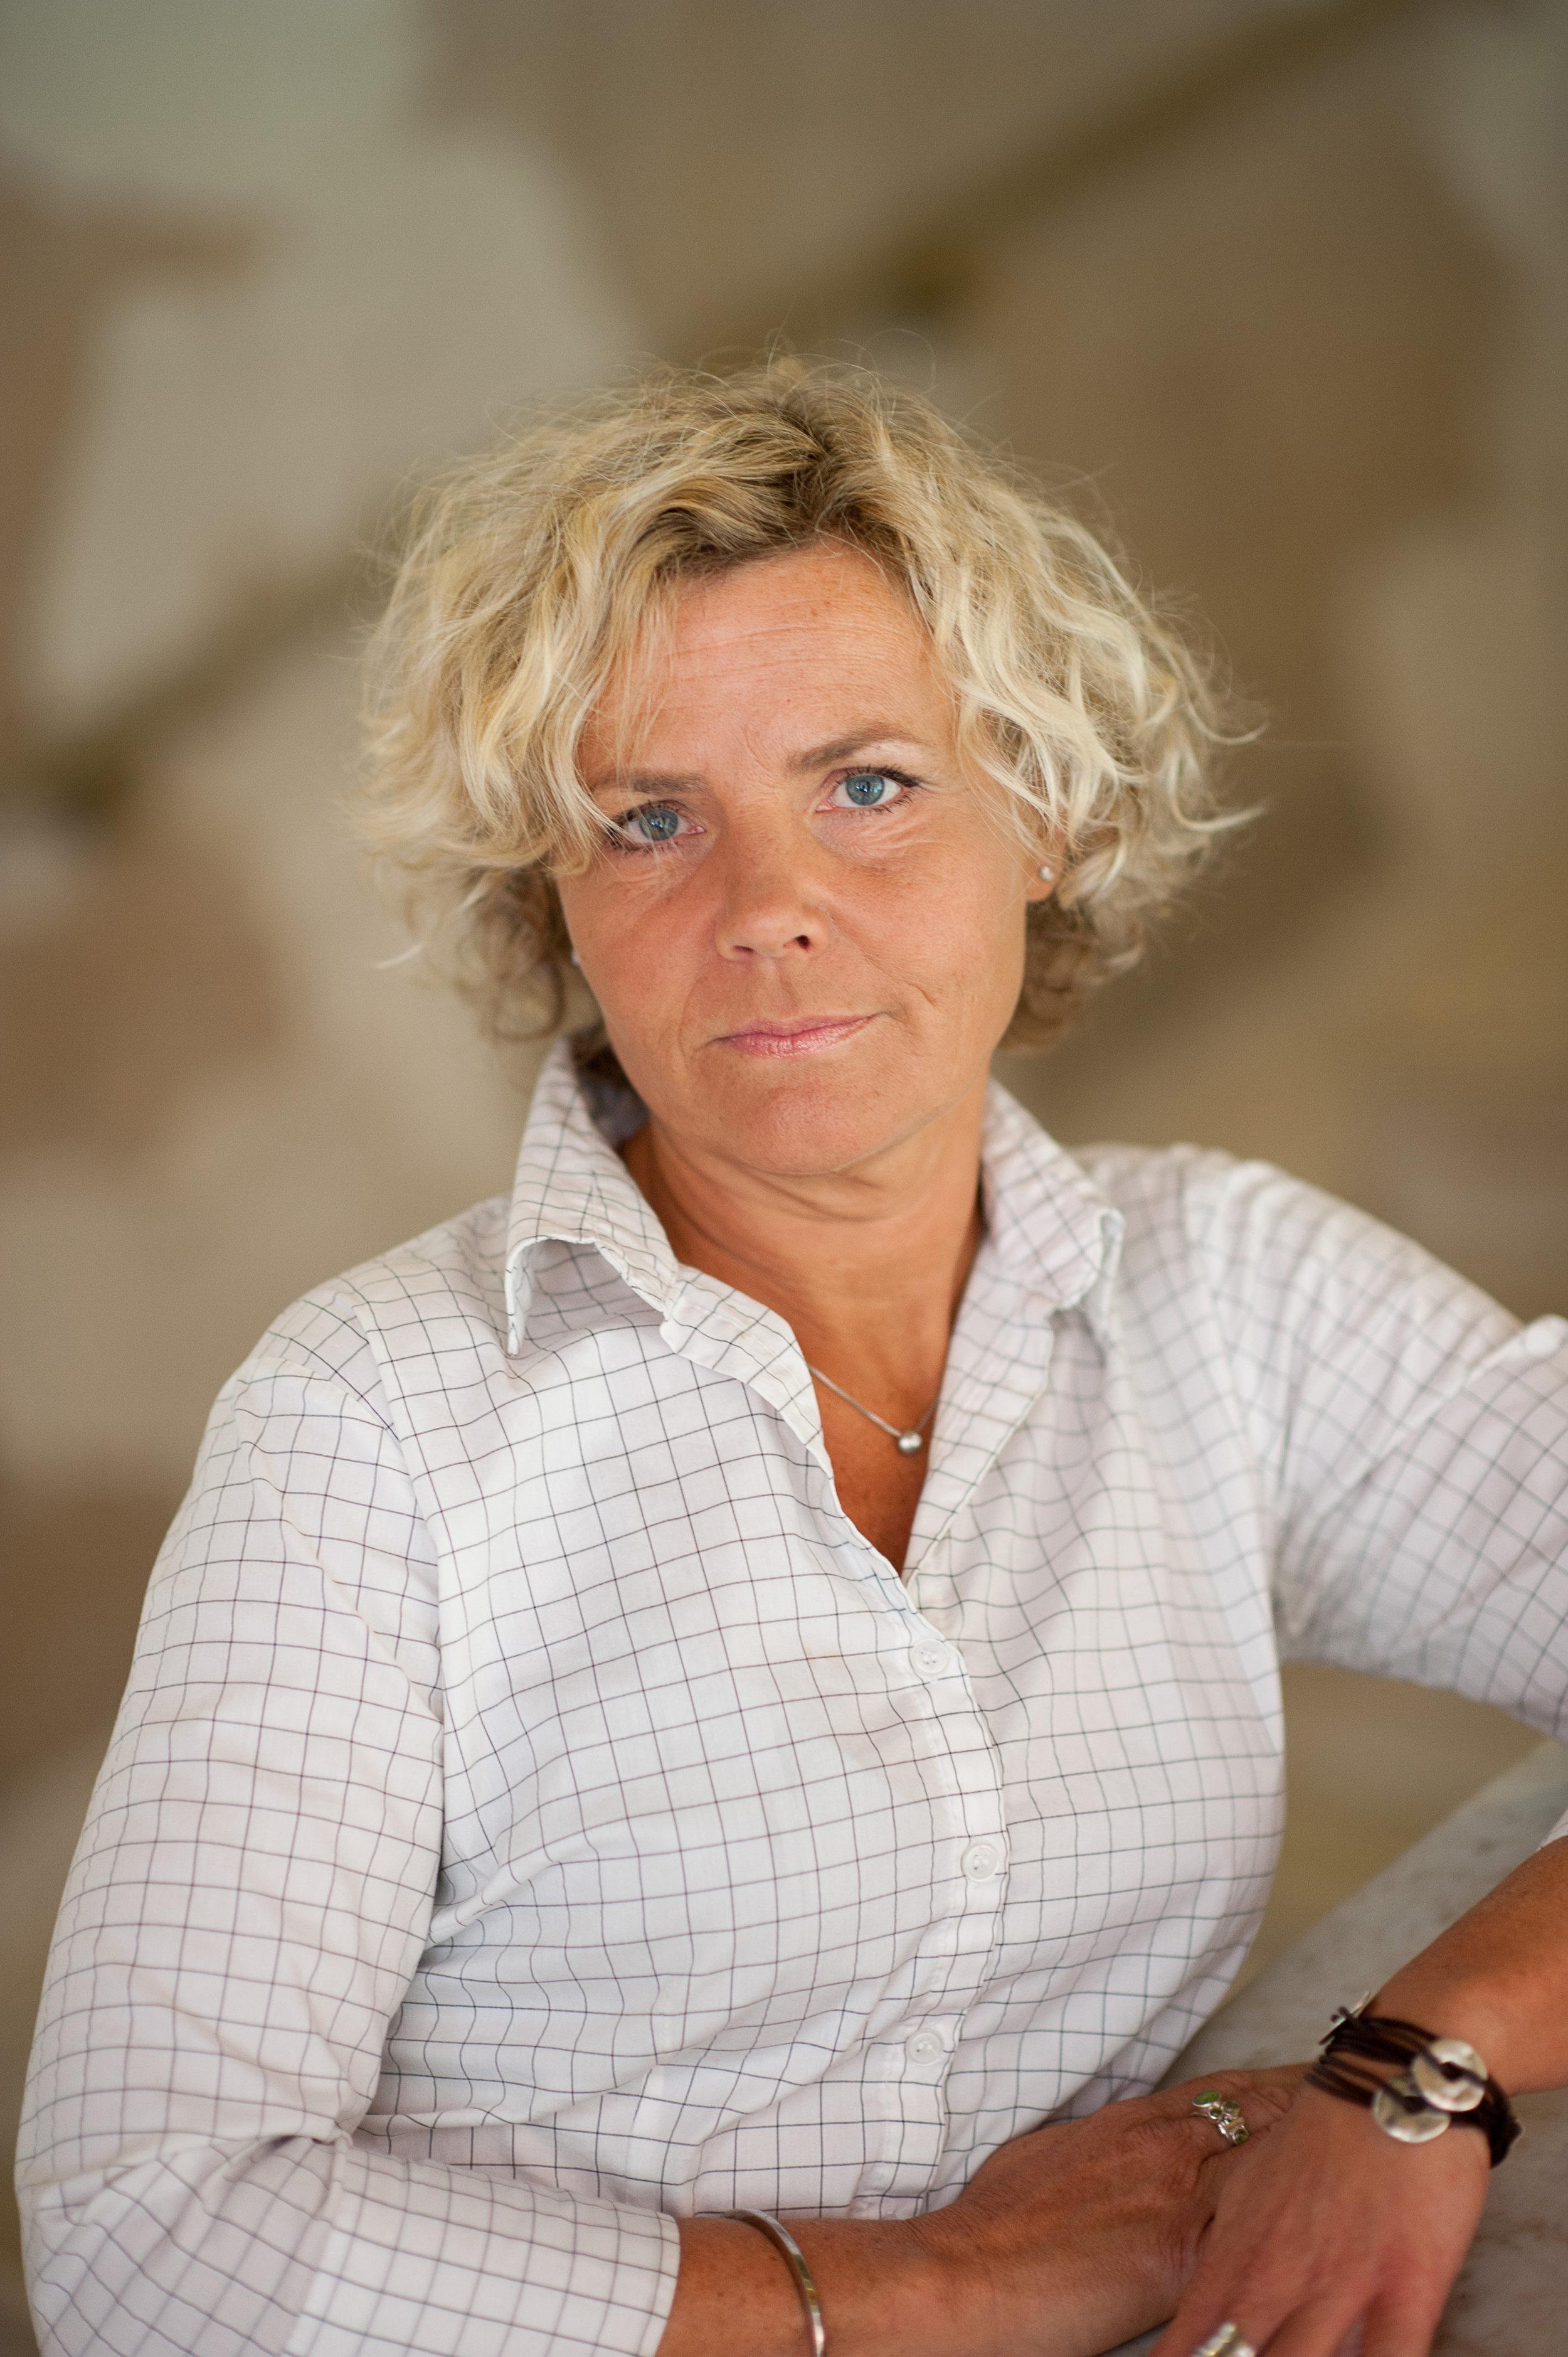 Anna Serner, Filminstitutets vd. Foto: Marie-Therese Karlberg